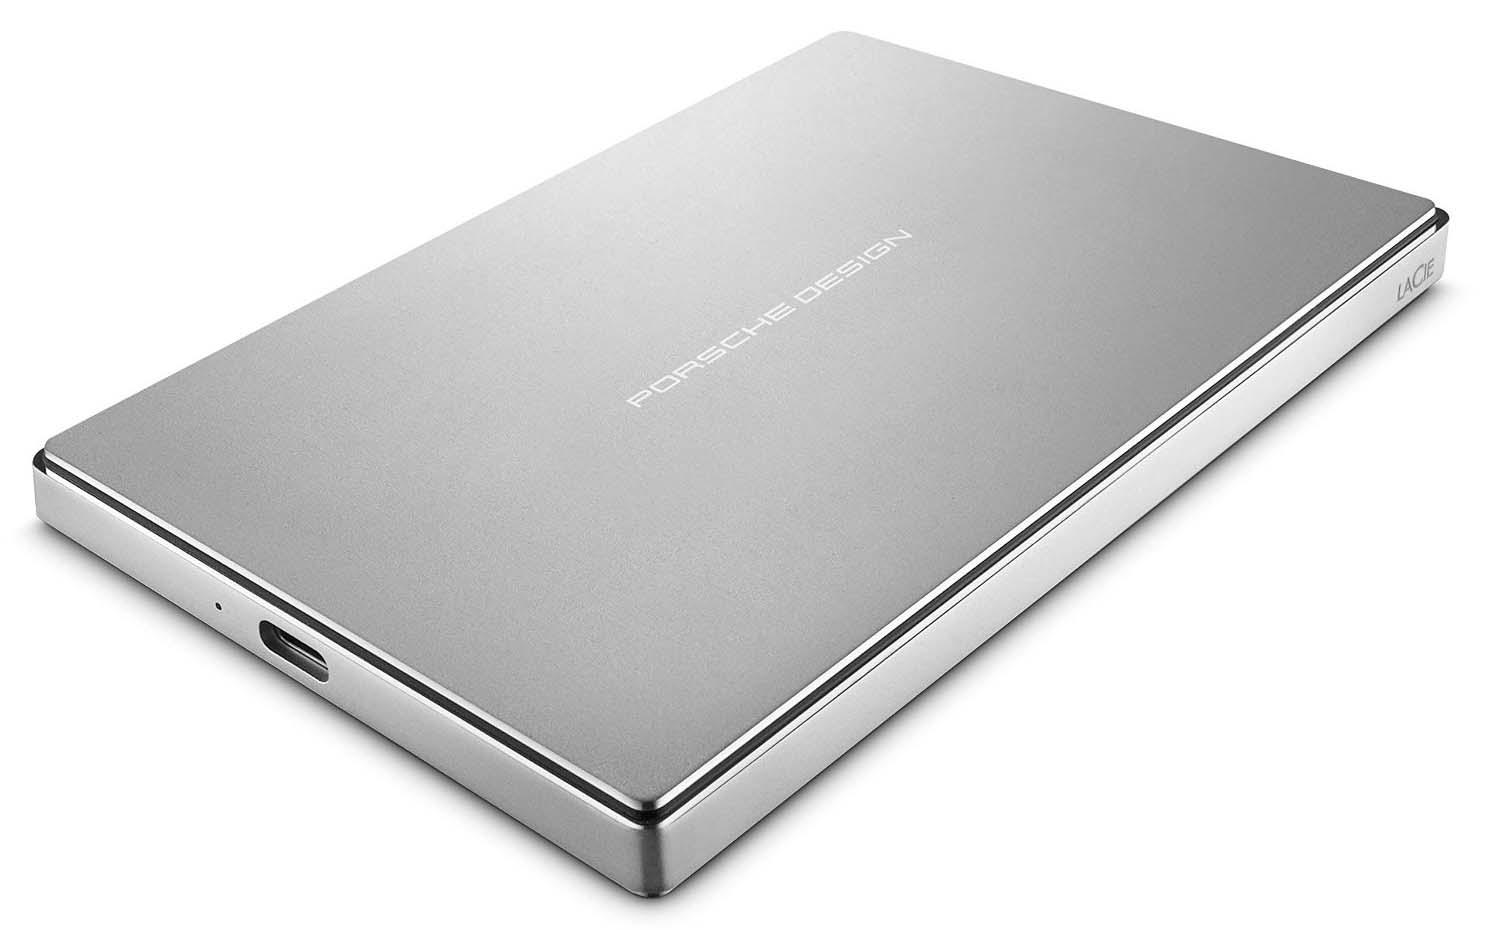 Купить LaCie Porsche Design Mobile 1TB USB 3.1 (STFD1000400) - внешний накопитель (Silver)